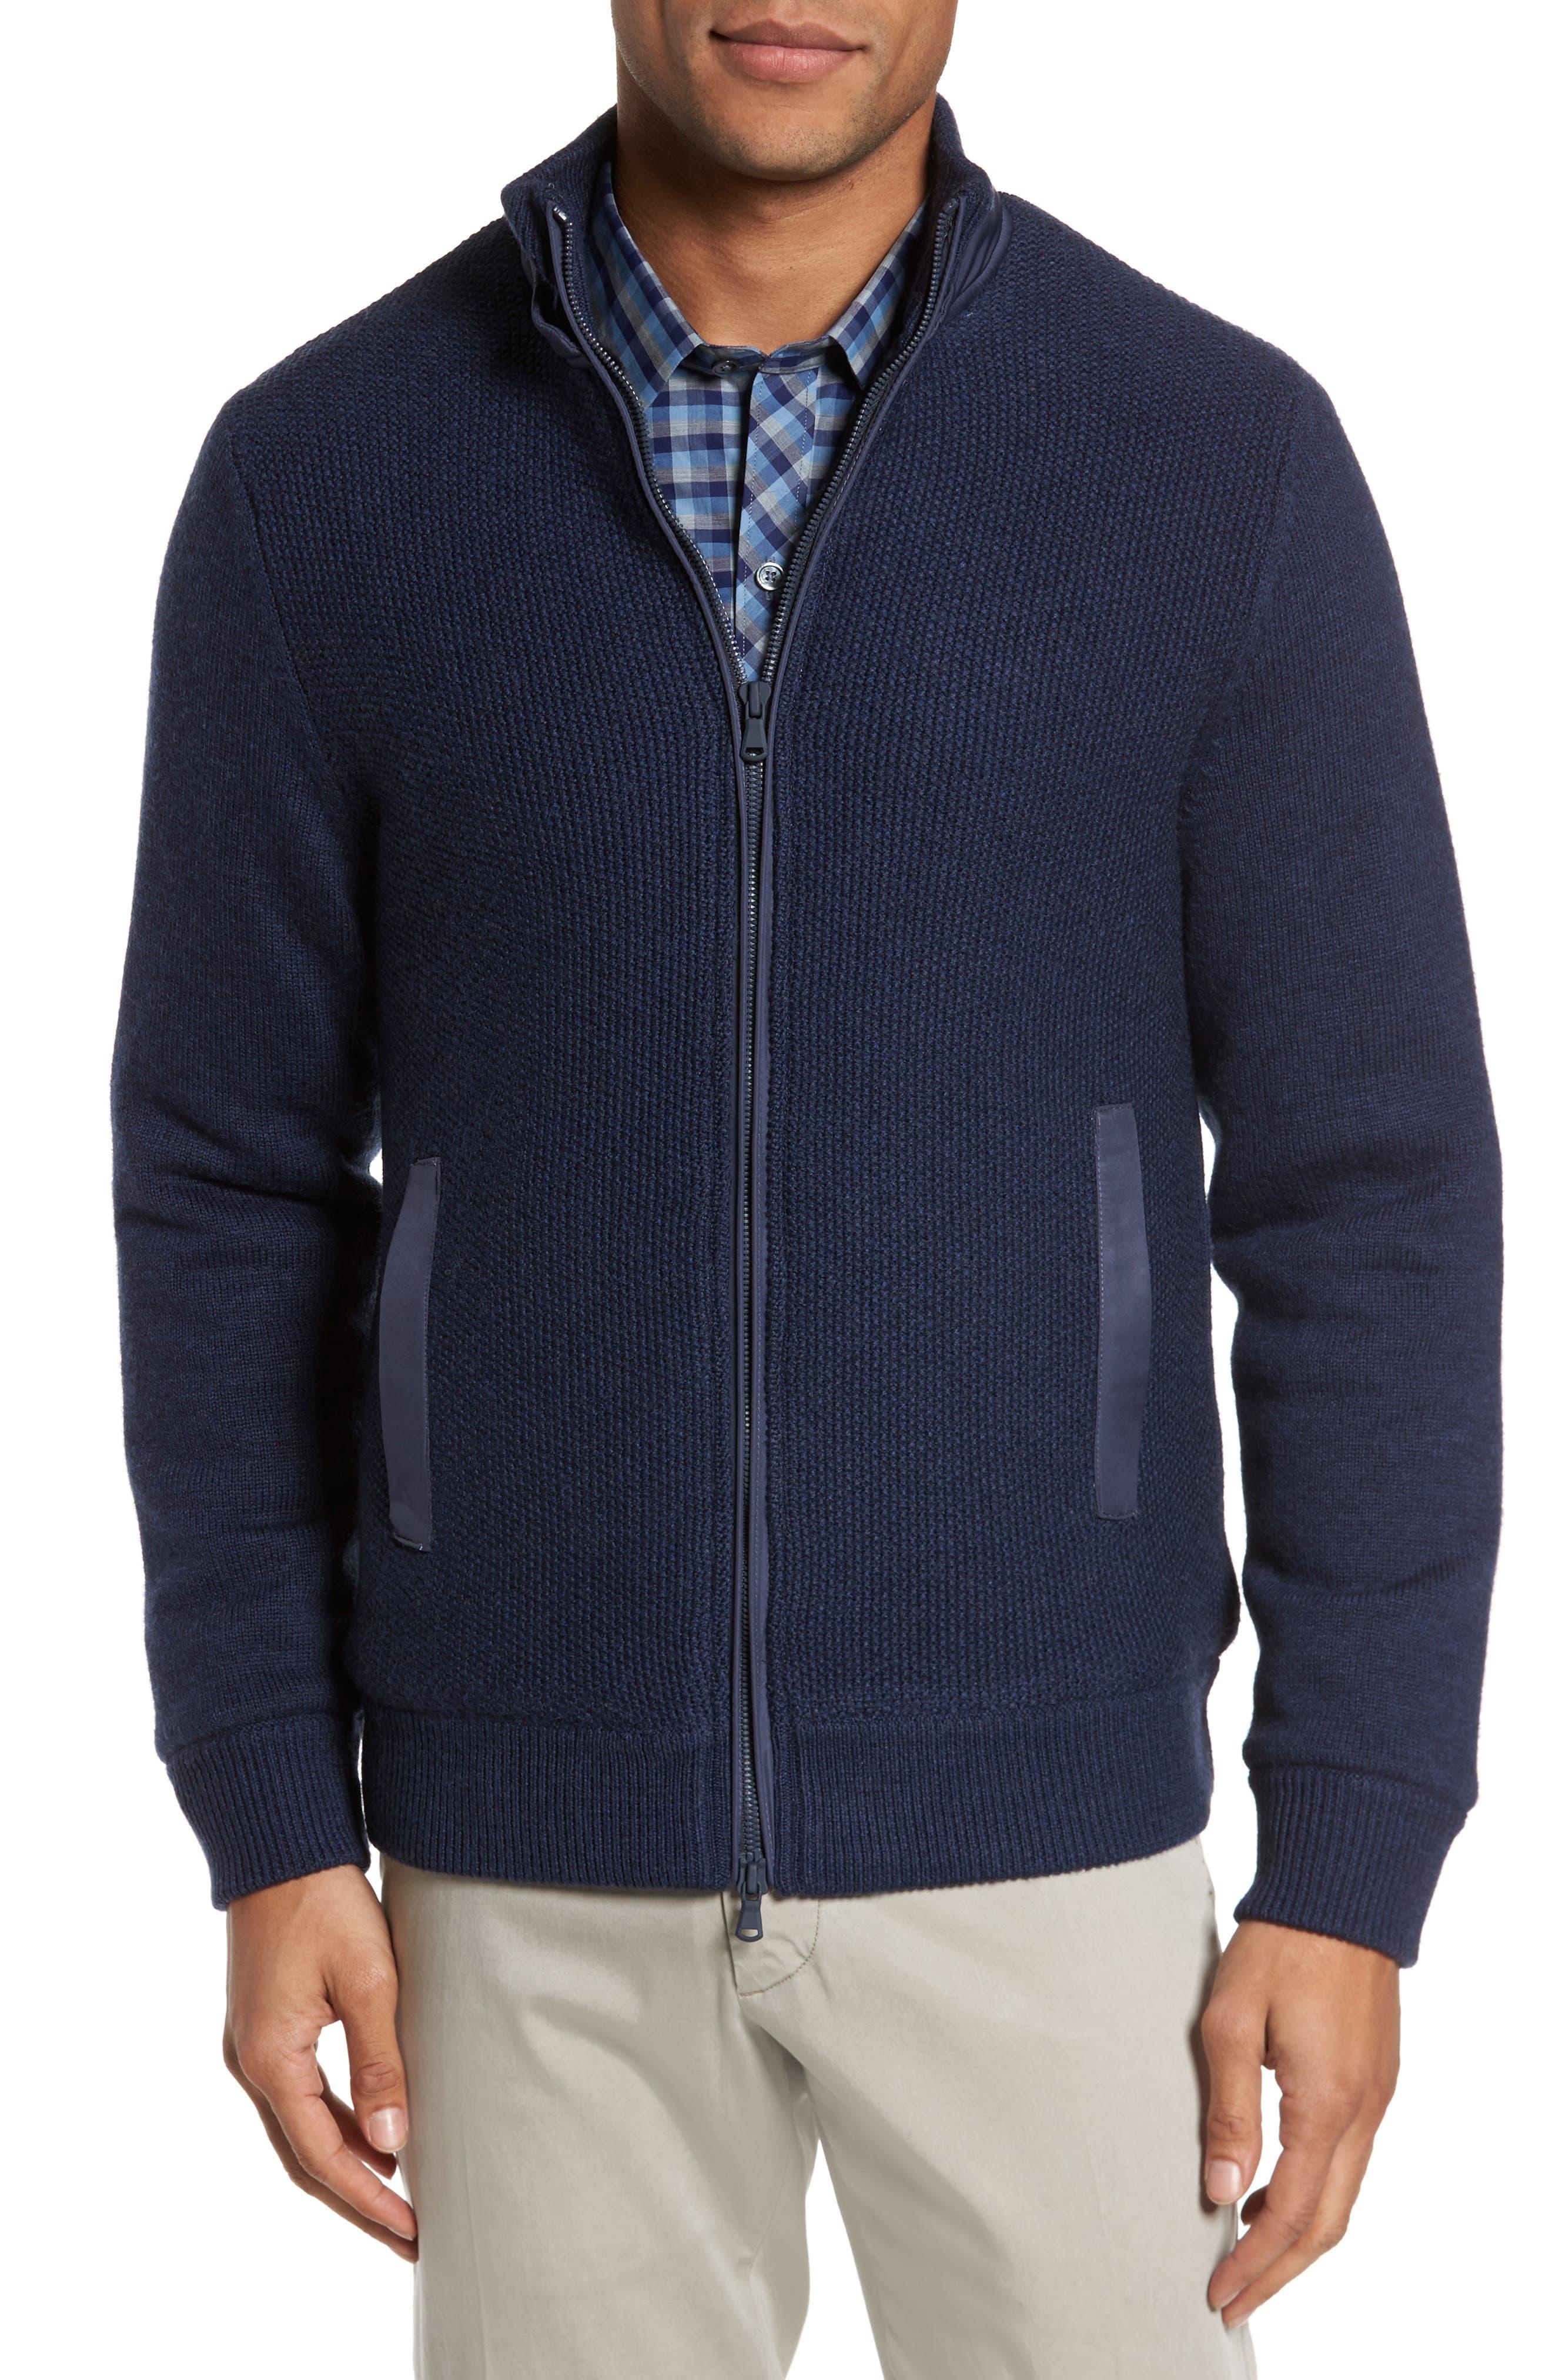 Haydon Merino Wool Sweater Jacket,                             Alternate thumbnail 4, color,                             410